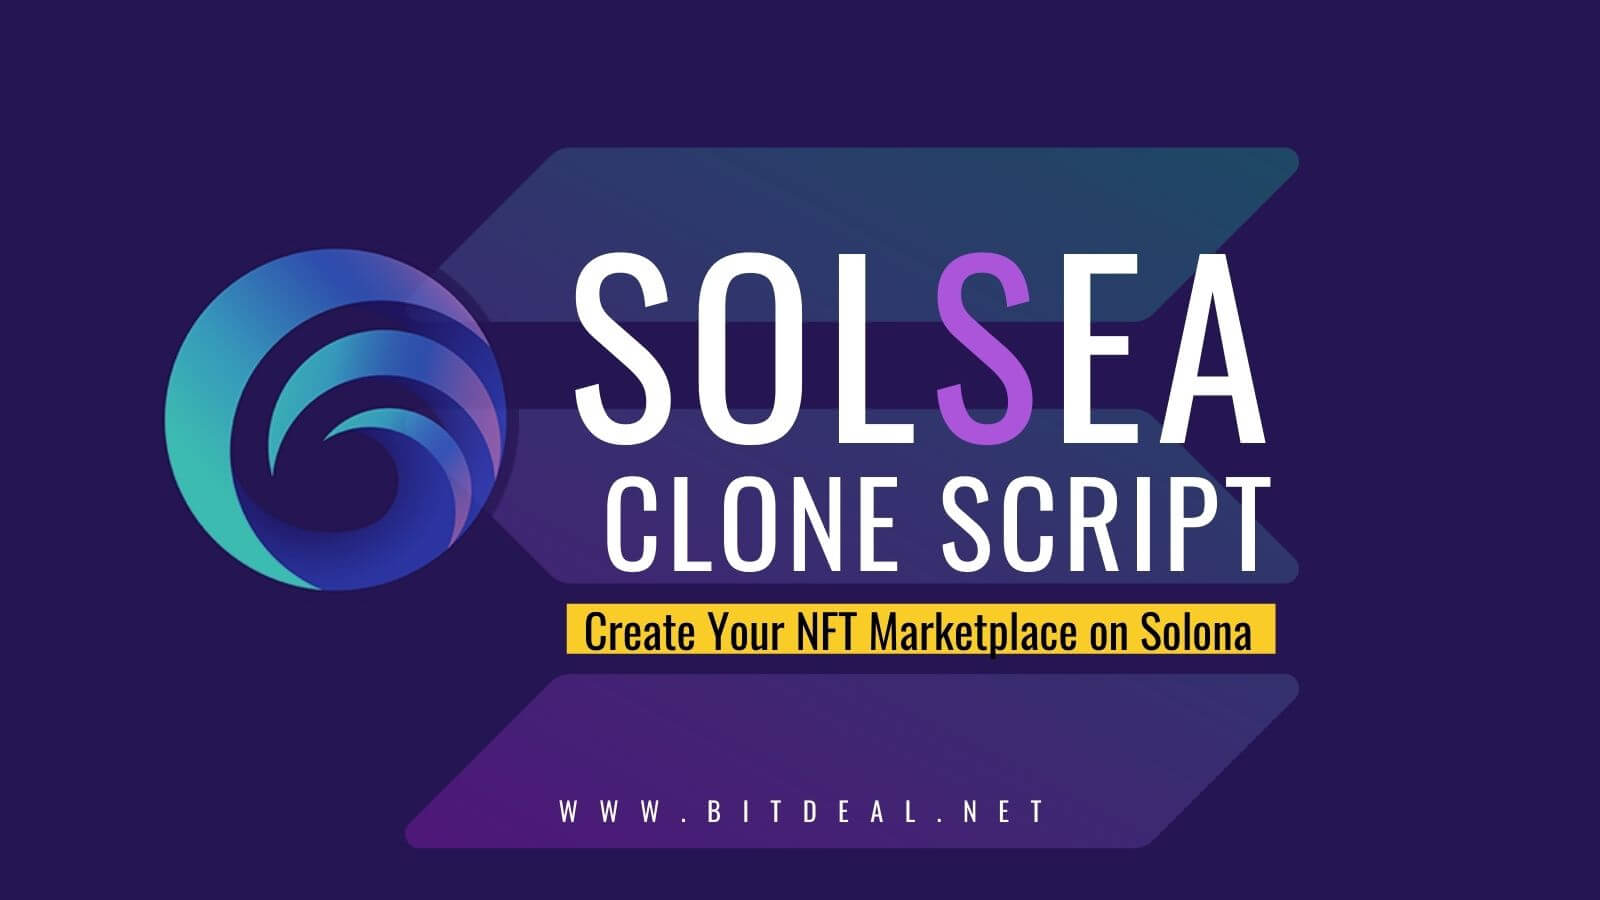 Solsea Clone Script to Build a NFT Marketplace like Solsea